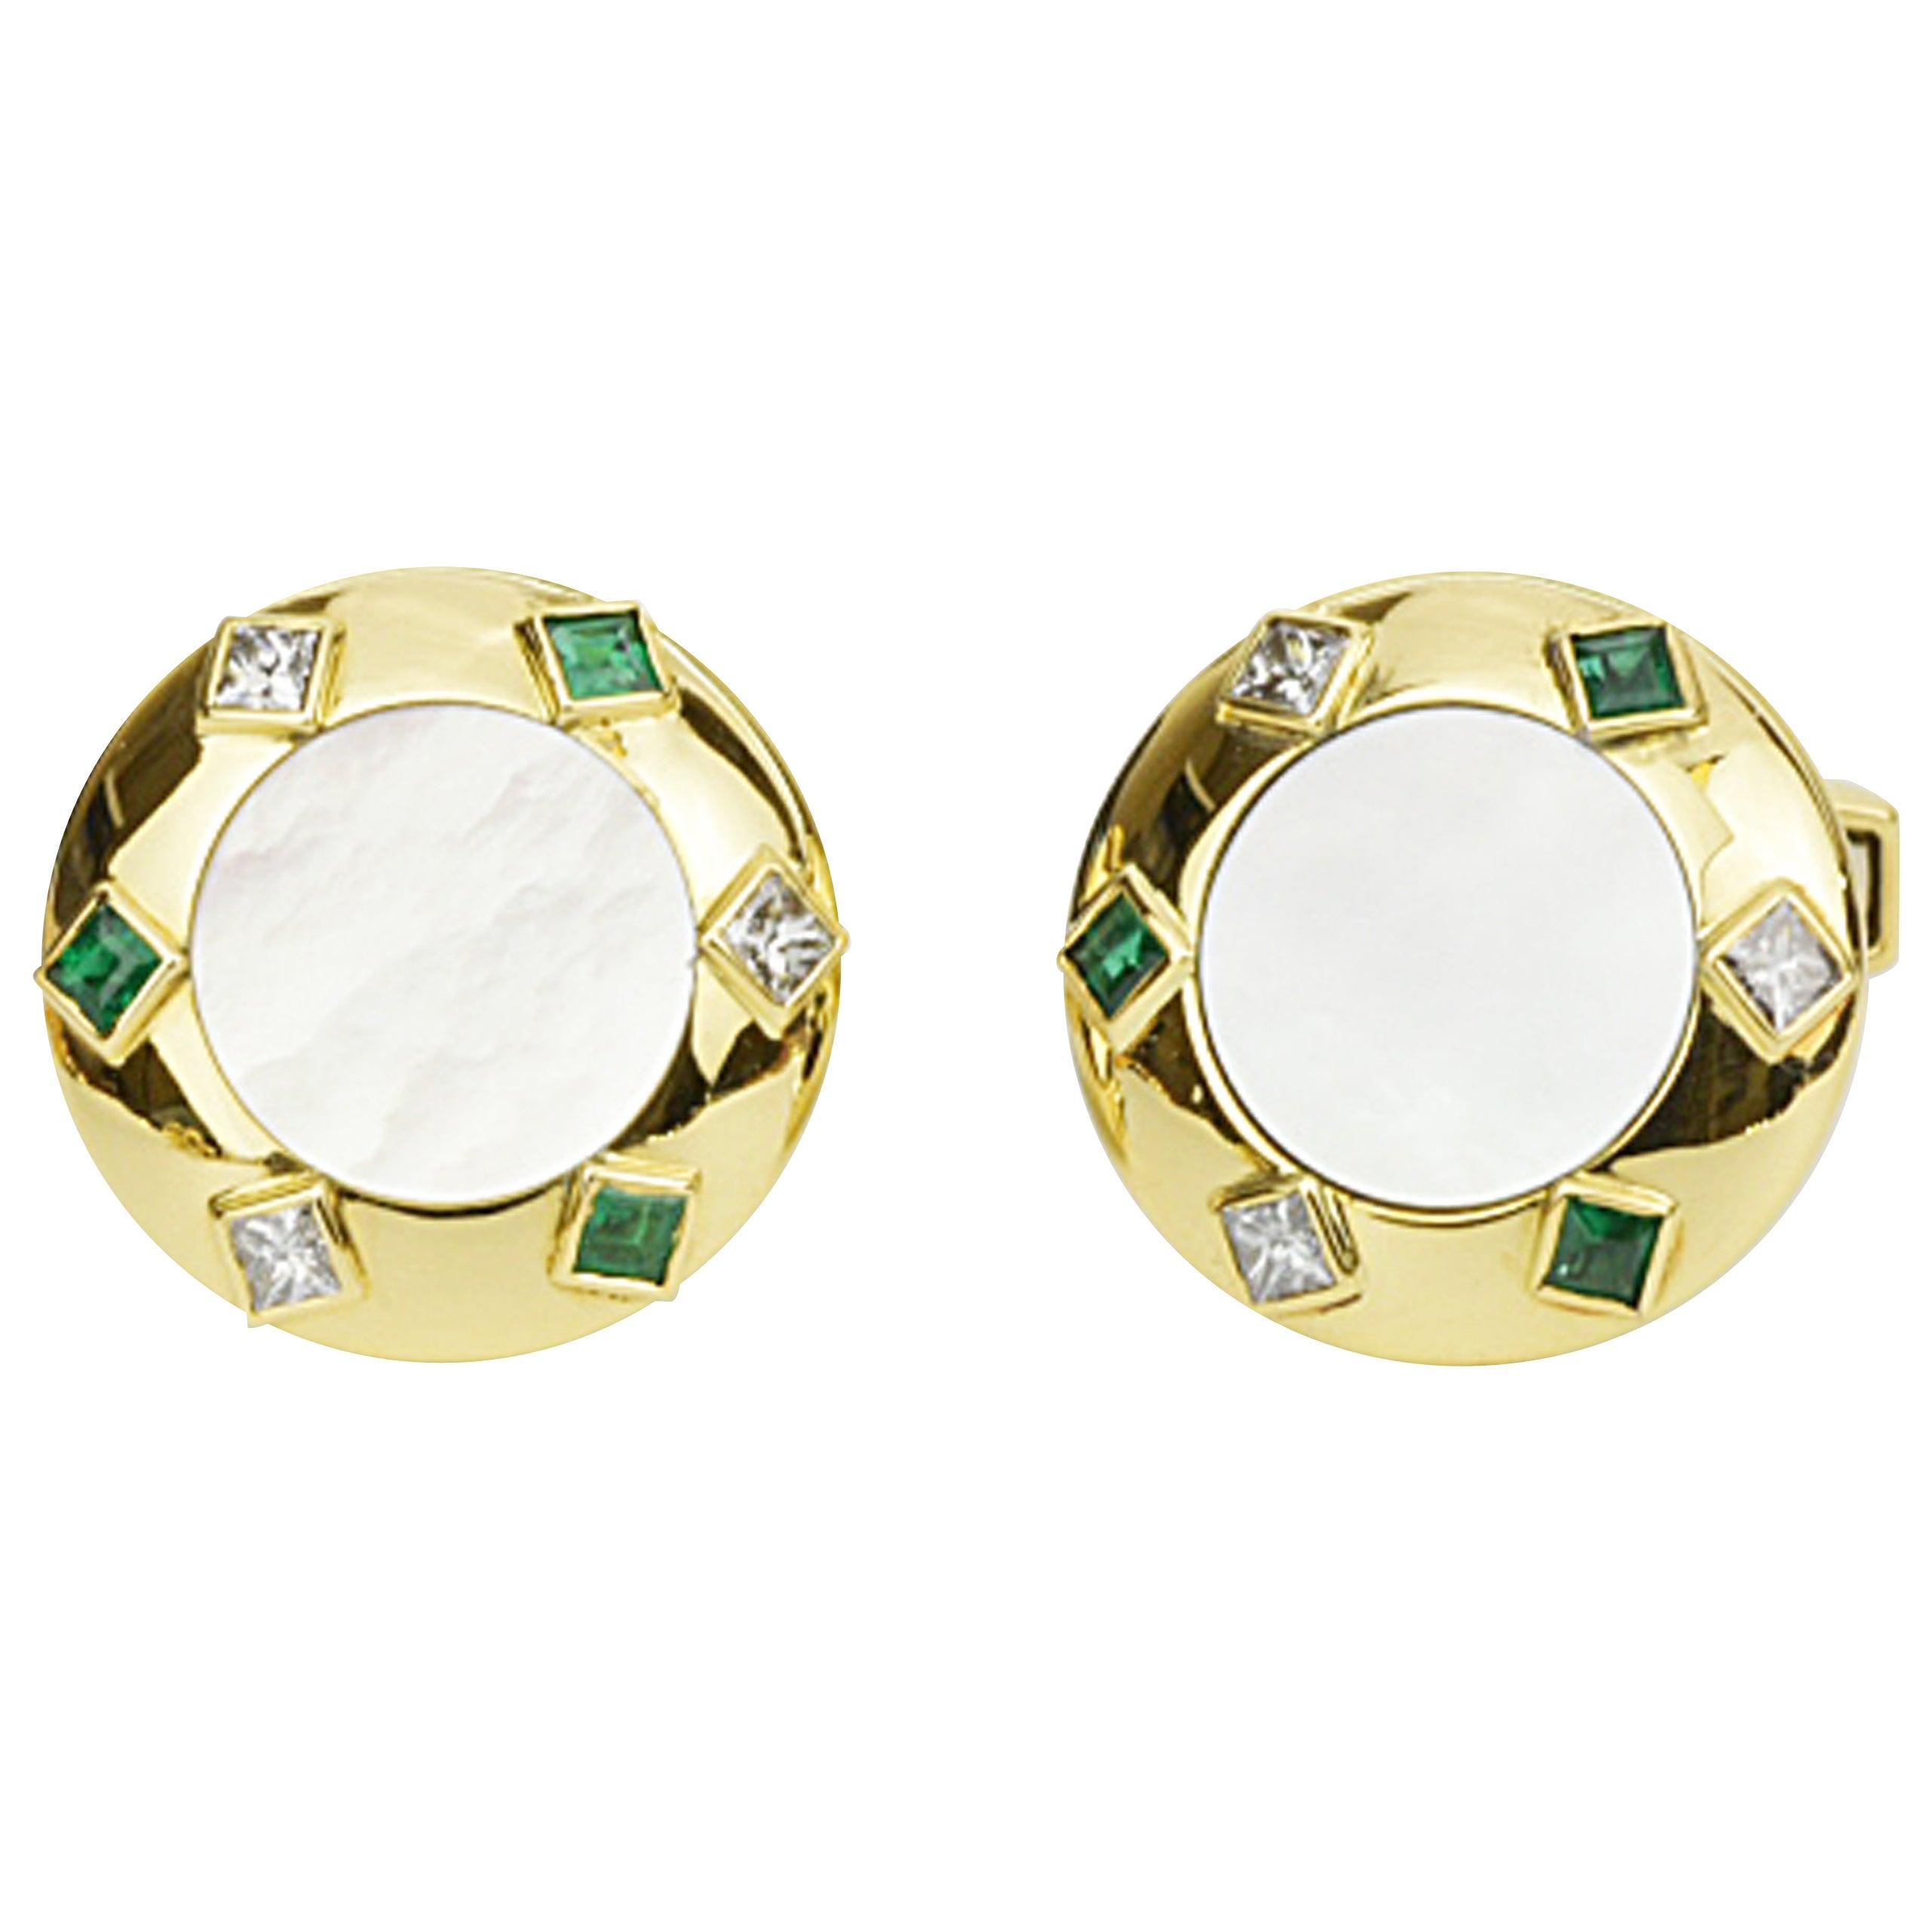 Matthew Cambery 18 Karat Gold Diamond Emerald and Mother of Pearl Cufflinks